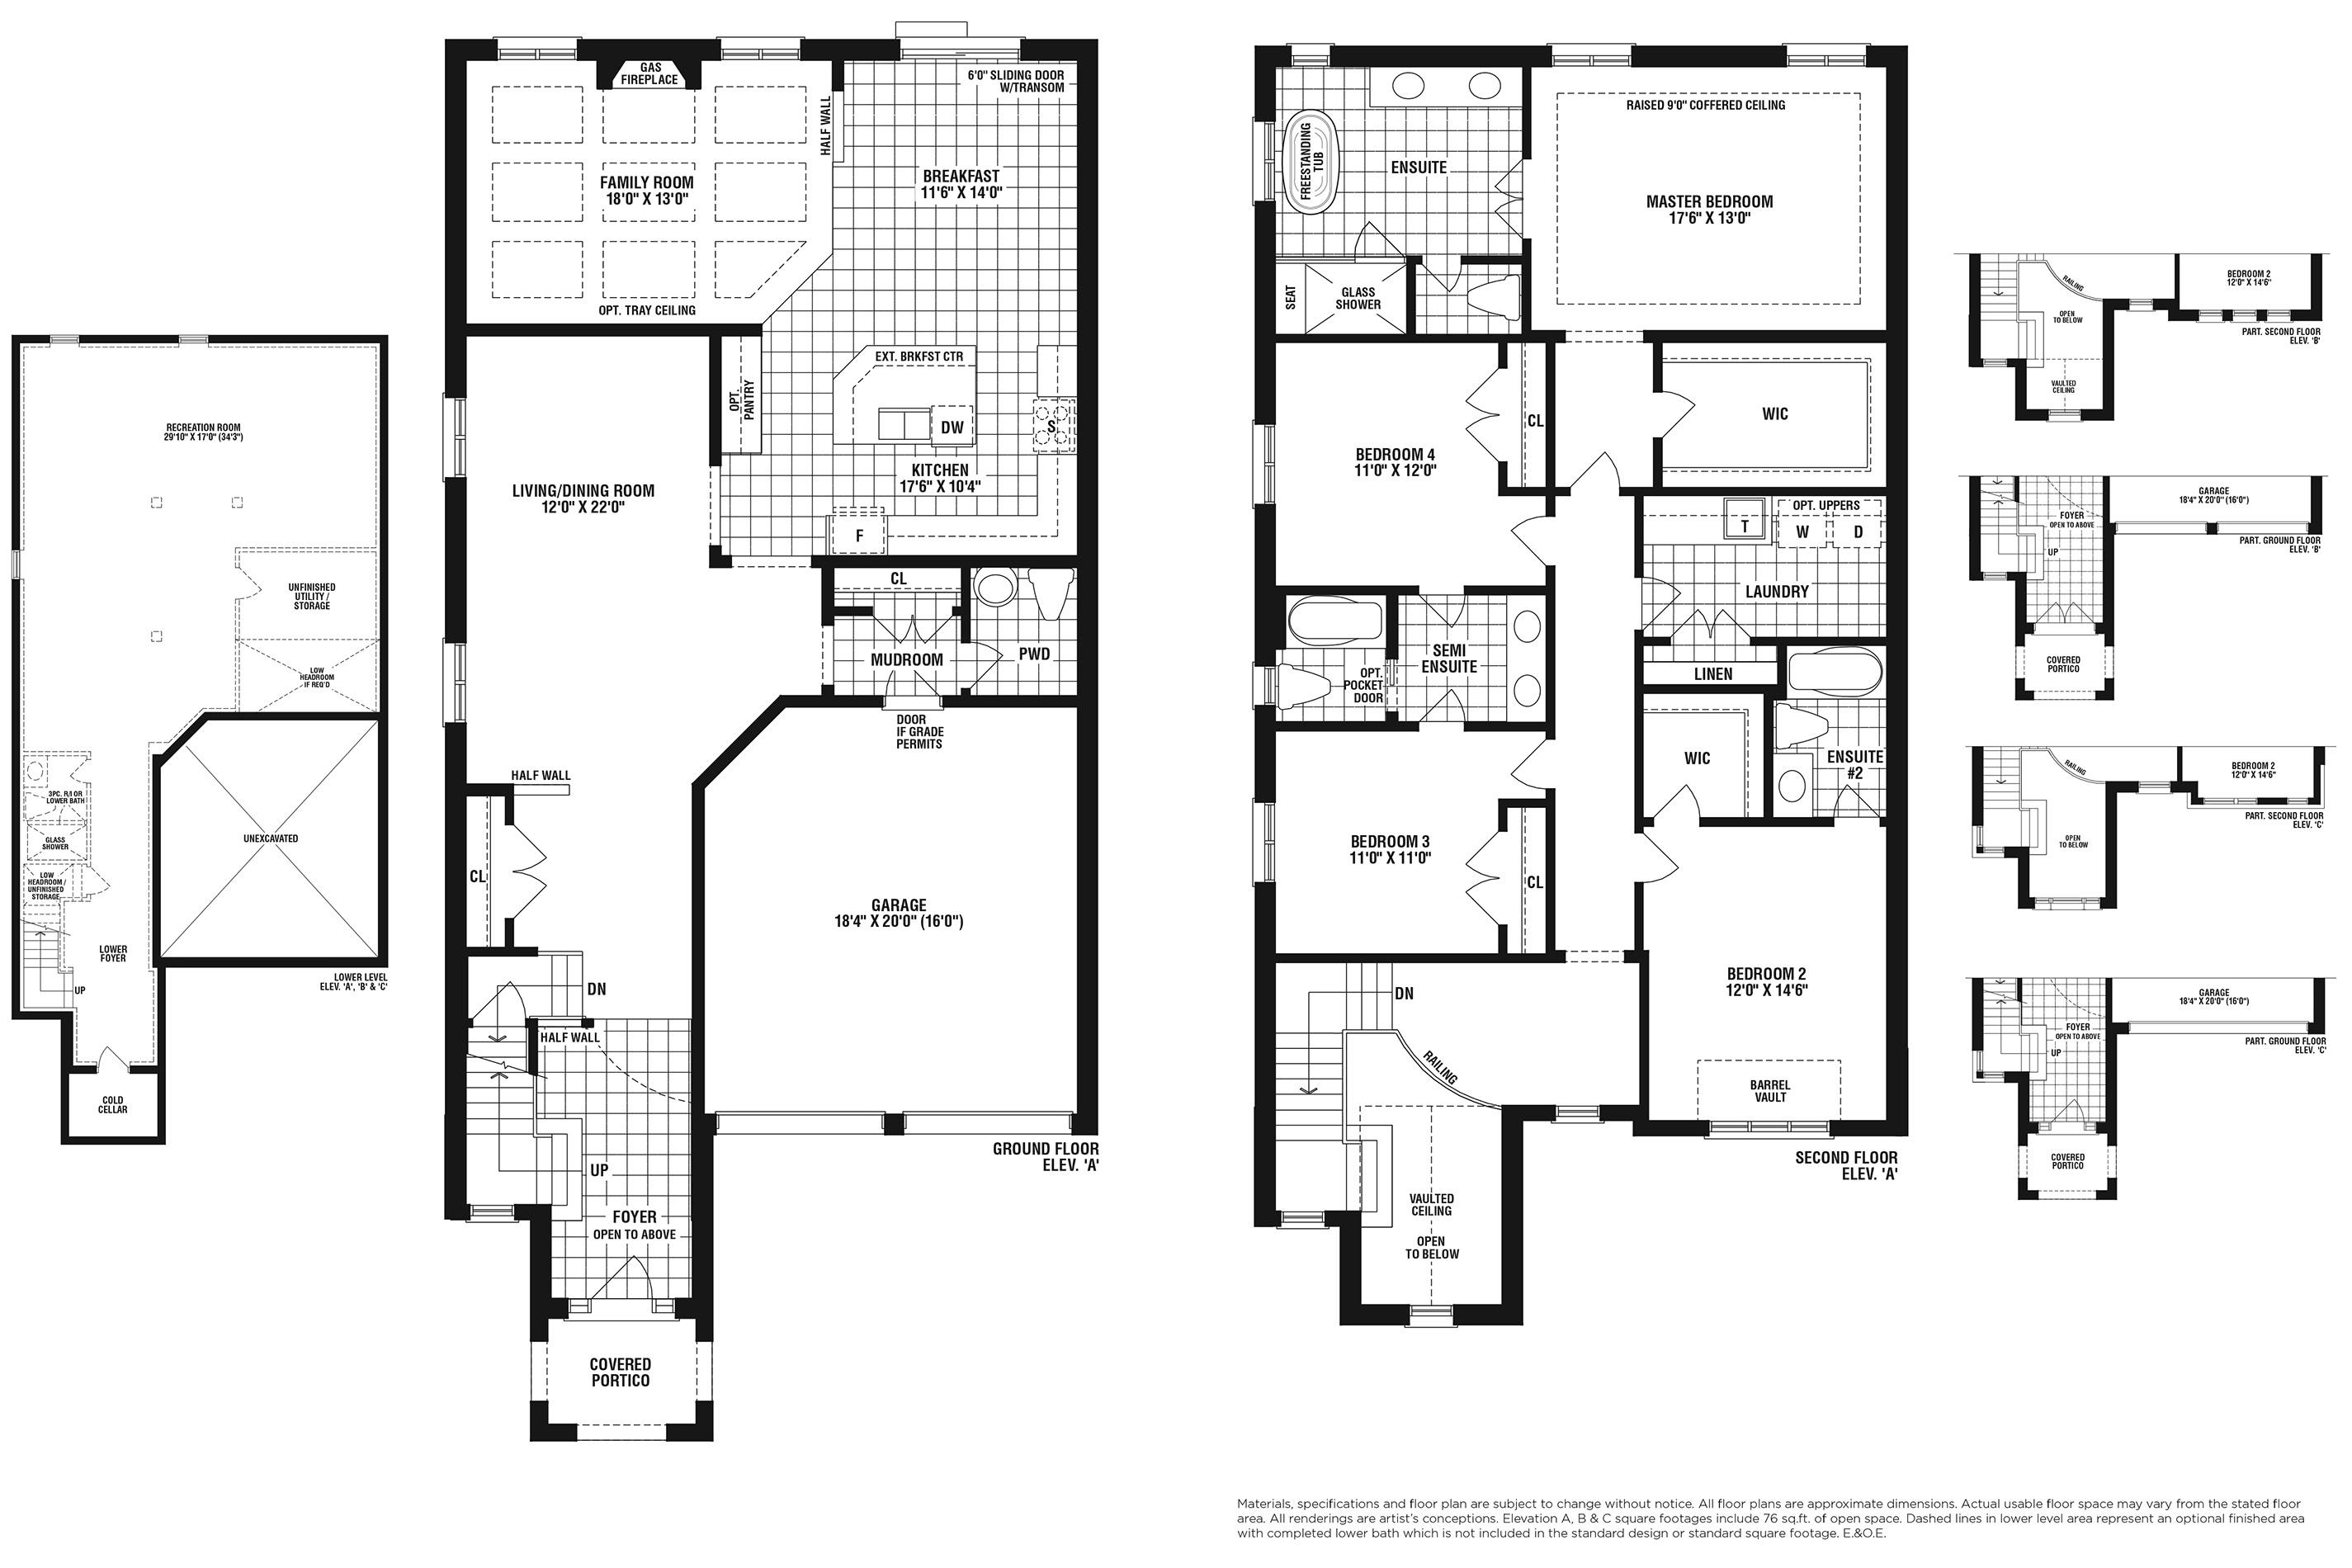 McCallum Floorplan